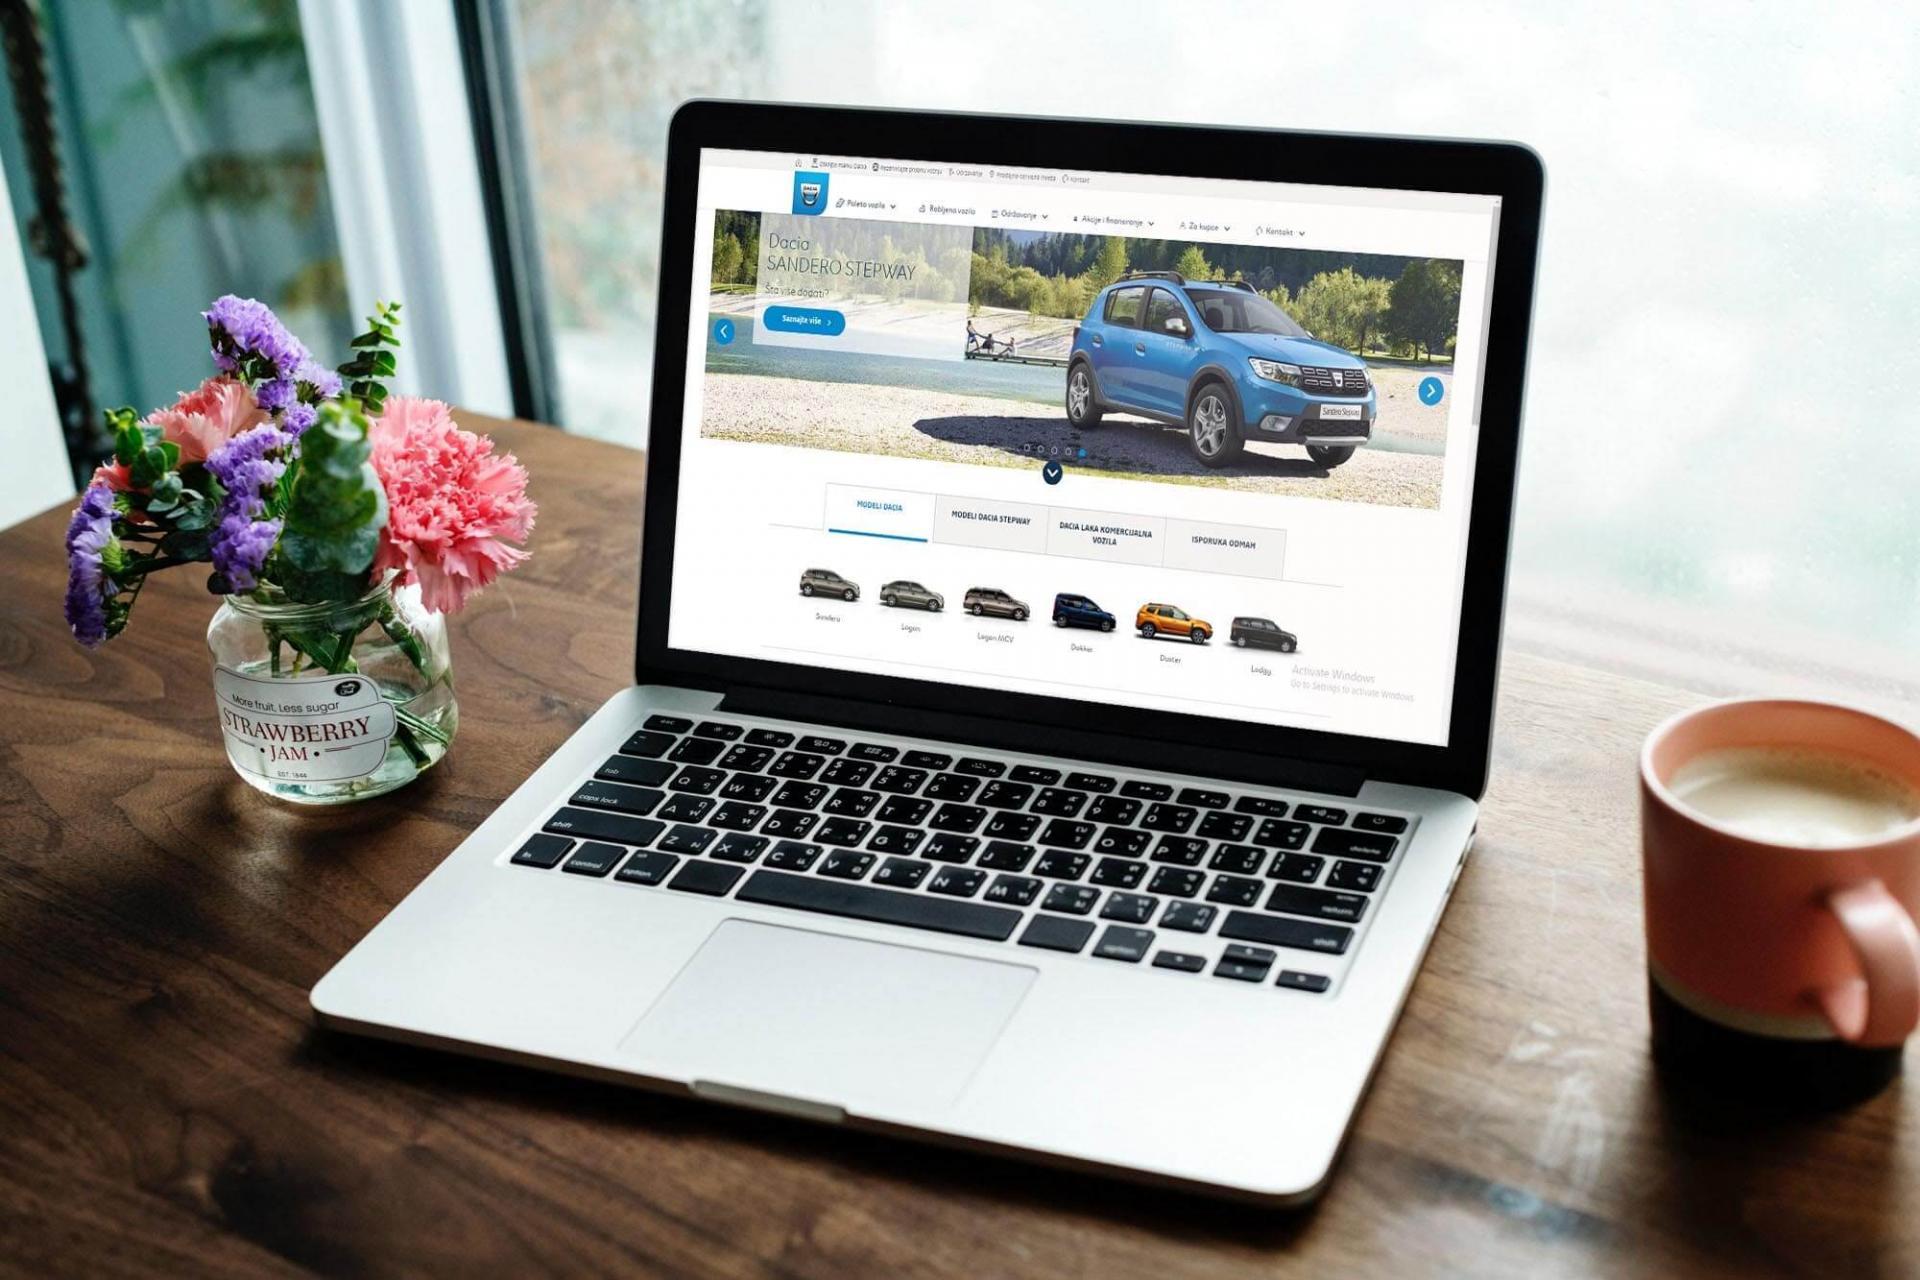 Dacia web application